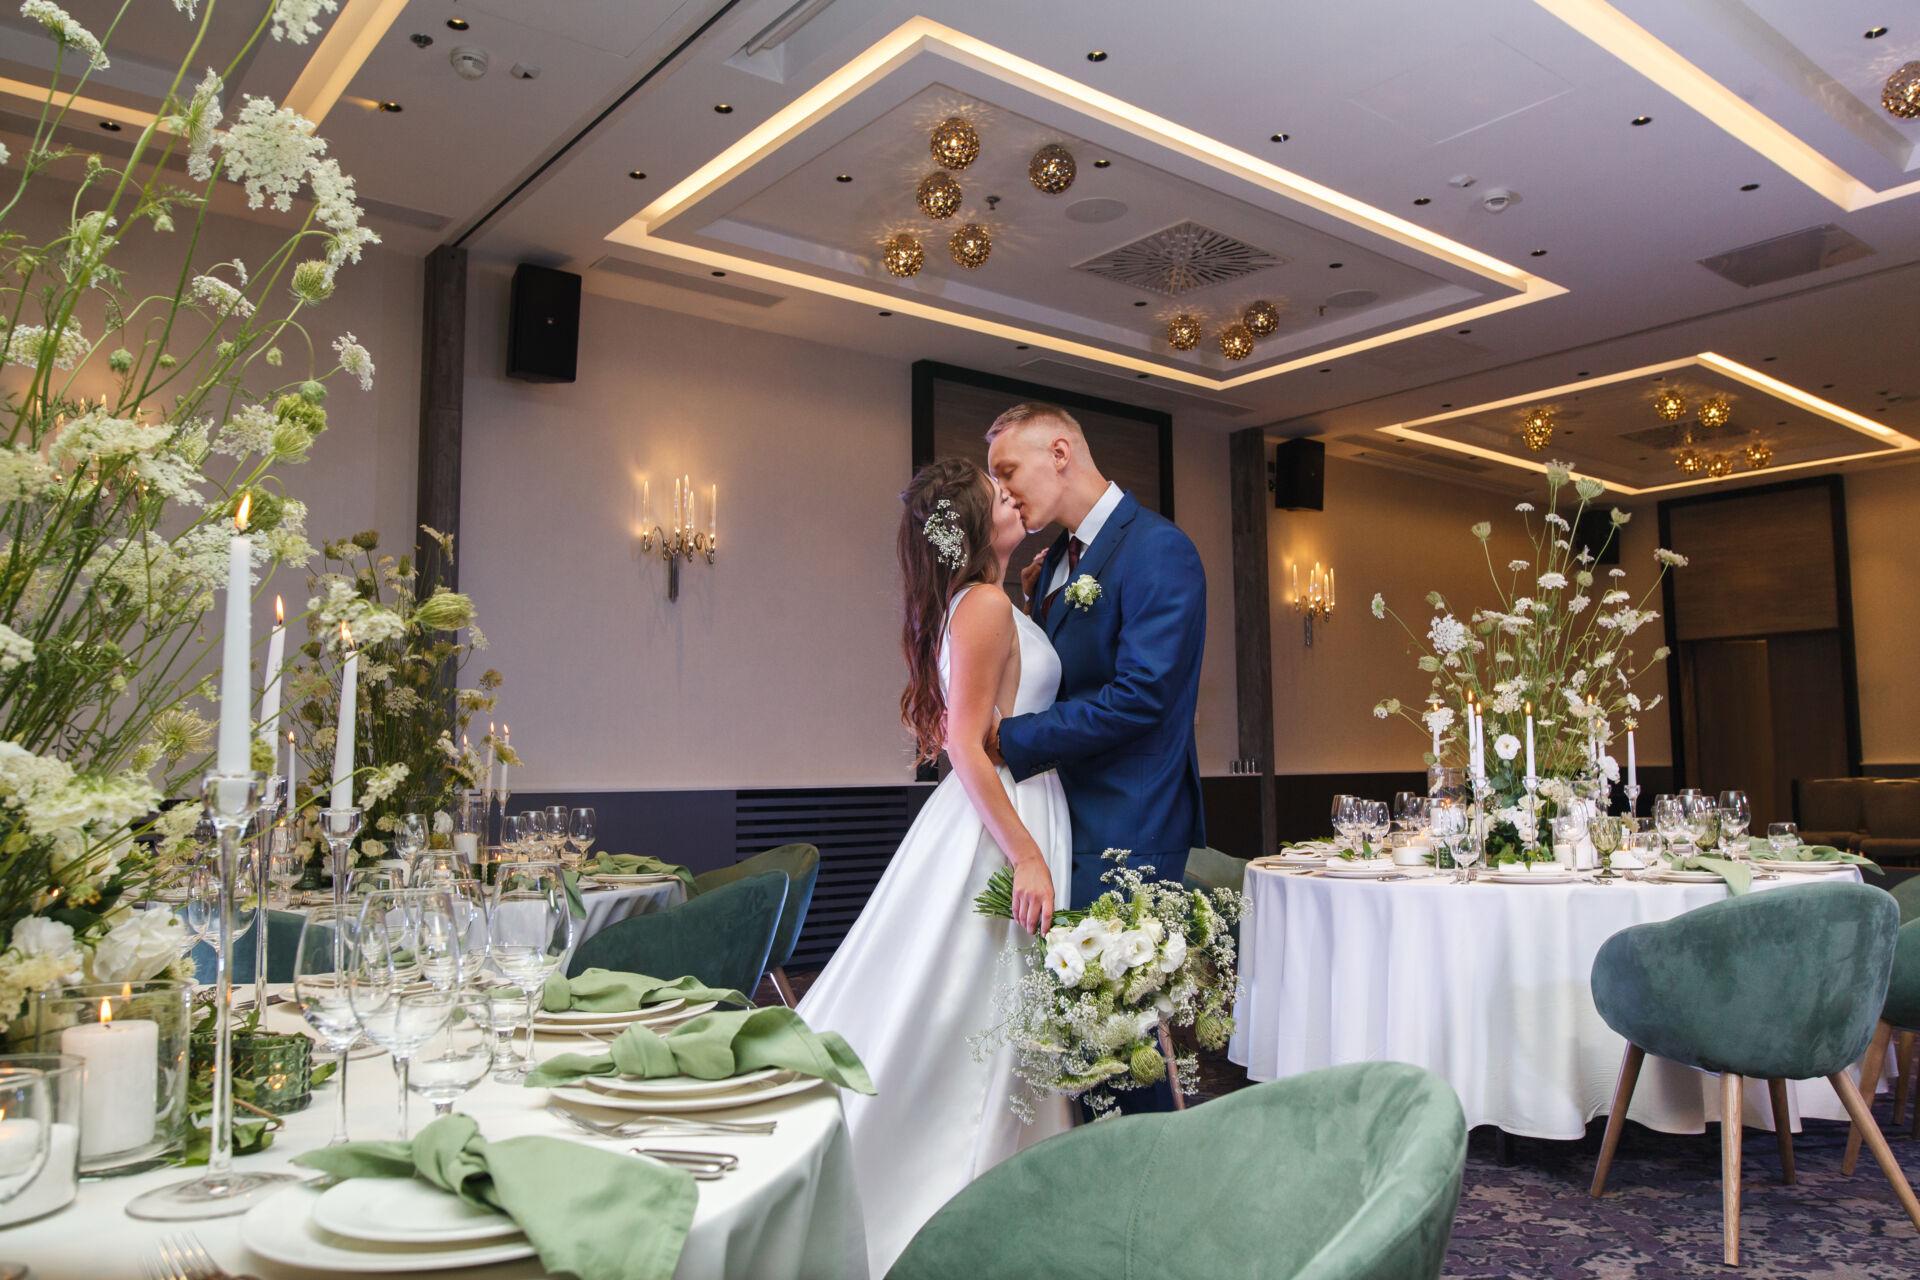 камерная свадьба, Radisson Blu Hotel Kyiv City Centre